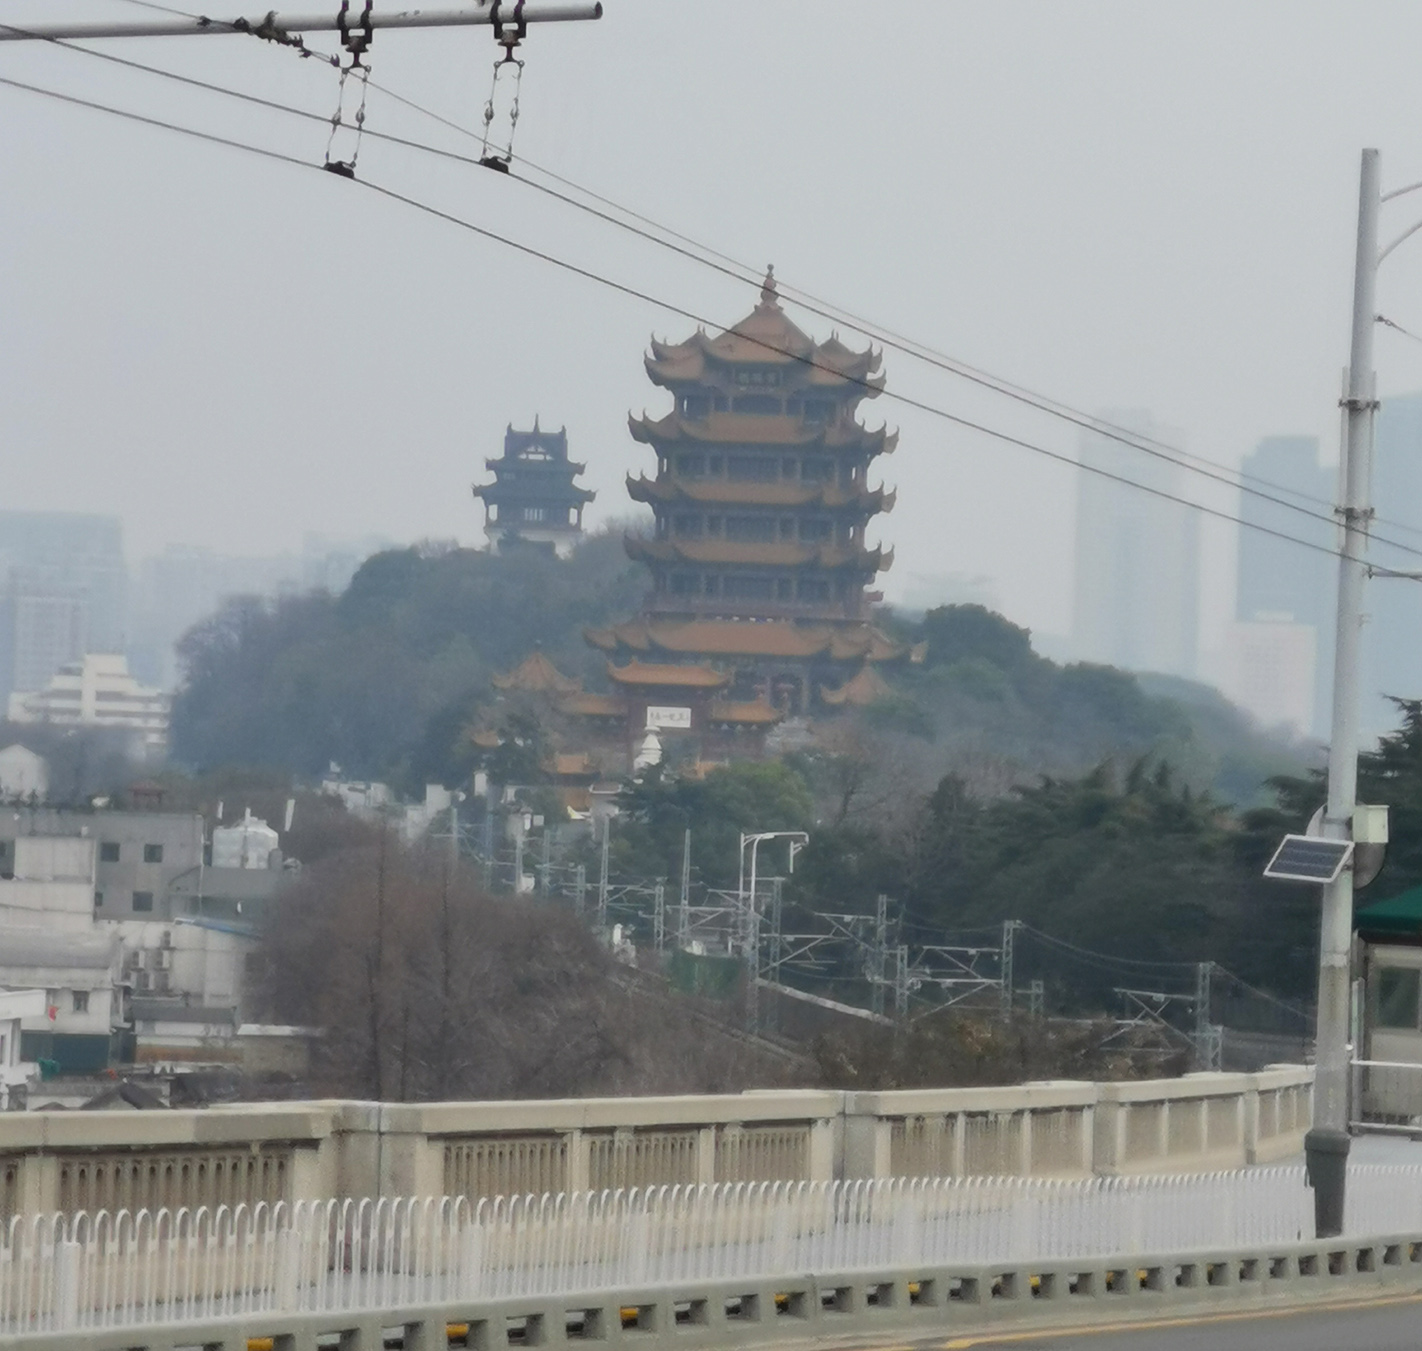 weiwei-crane.jpg